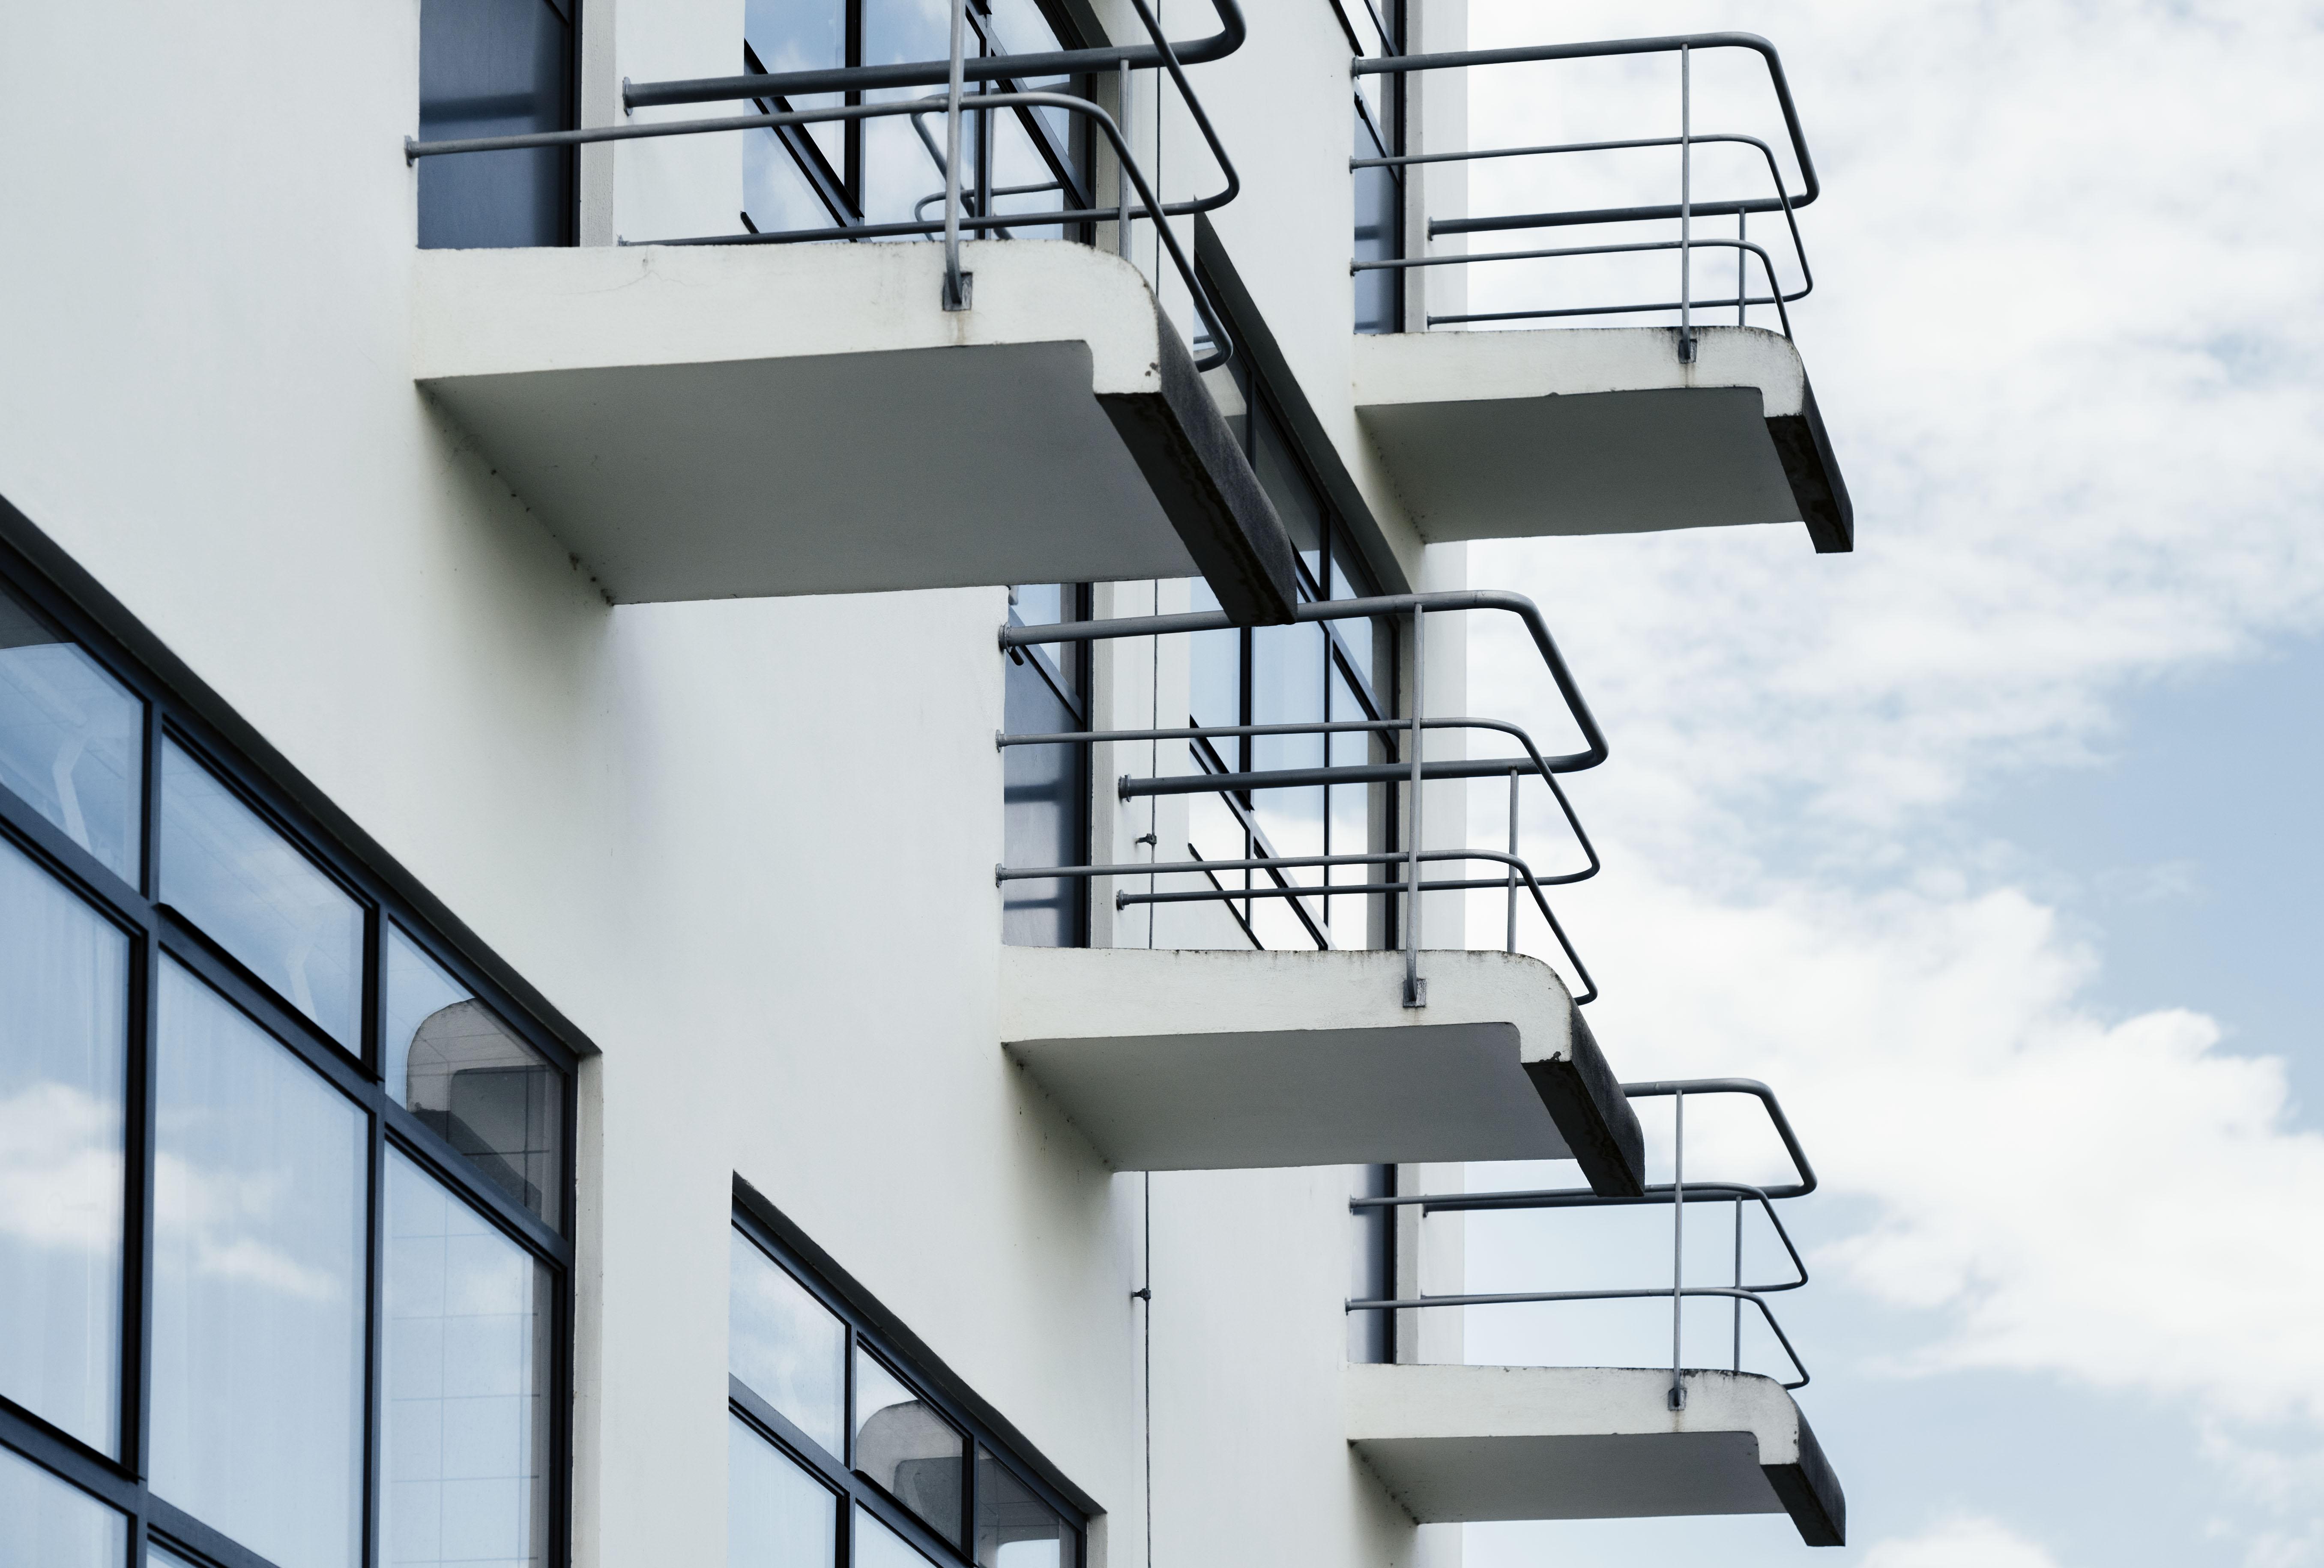 Dessau-Roßlau Bauhausgebäude / Bauhaus building (1925–26) Balkone des Atelierhauses, Architekt / architect: Walter Gropius Photo: © Tillmann Franzen, tillmannfranzen.com © VG Bild-Kunst, Bonn 2018